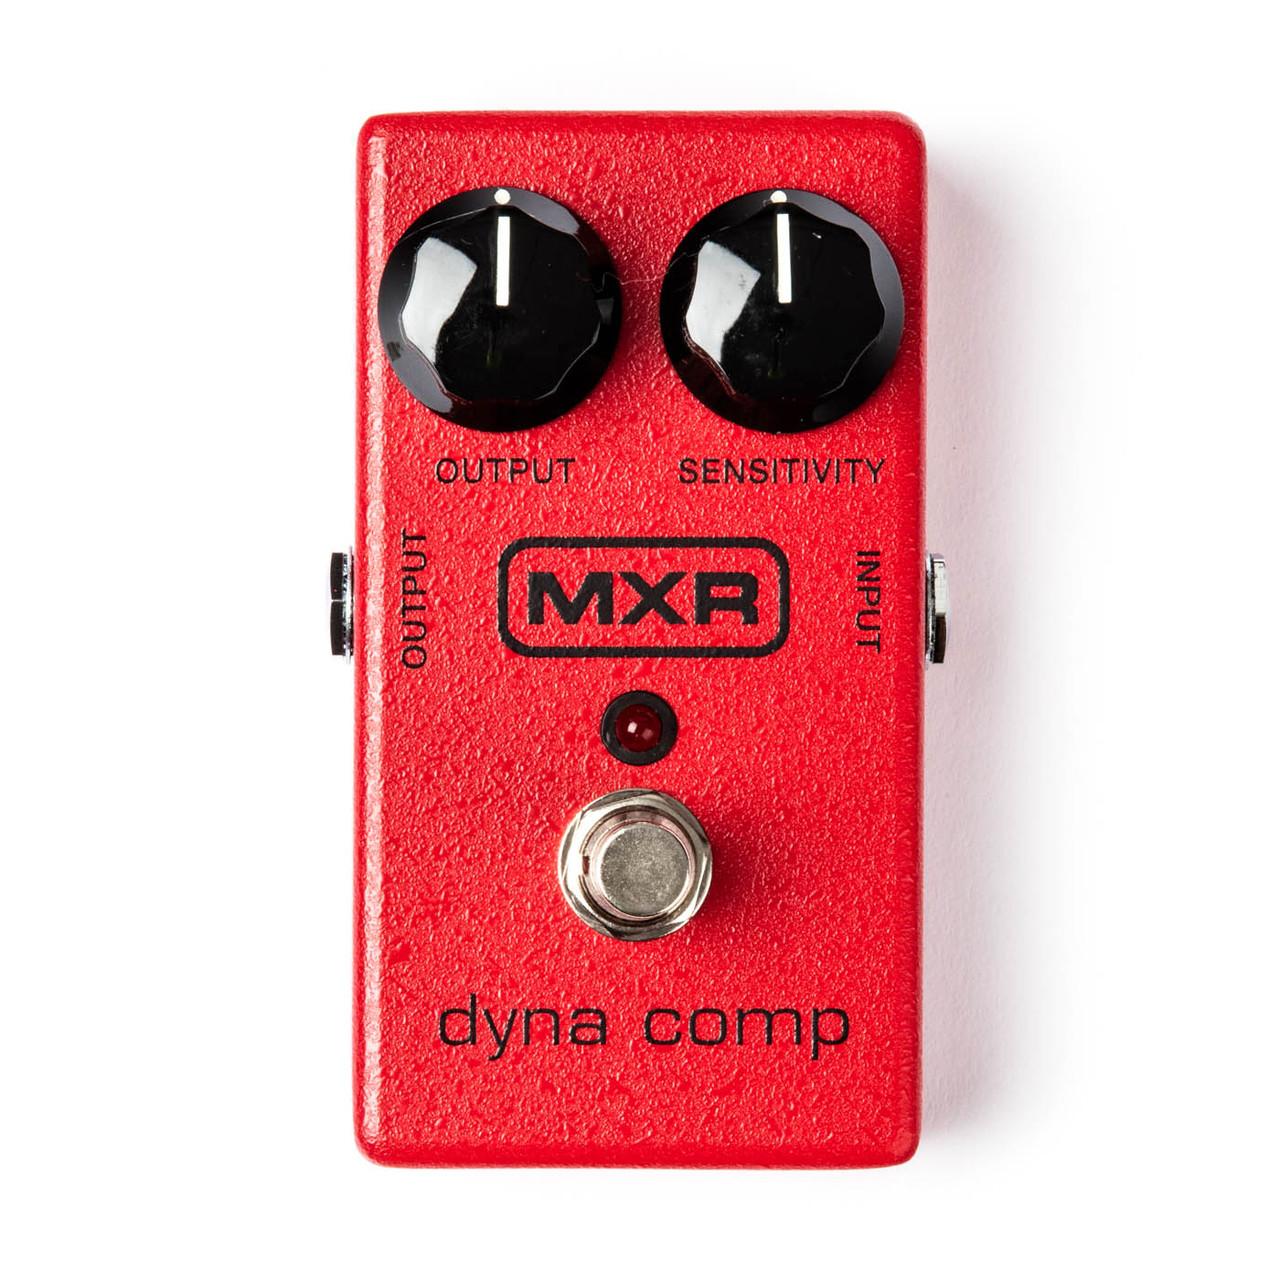 Mxr dyna comp schematic